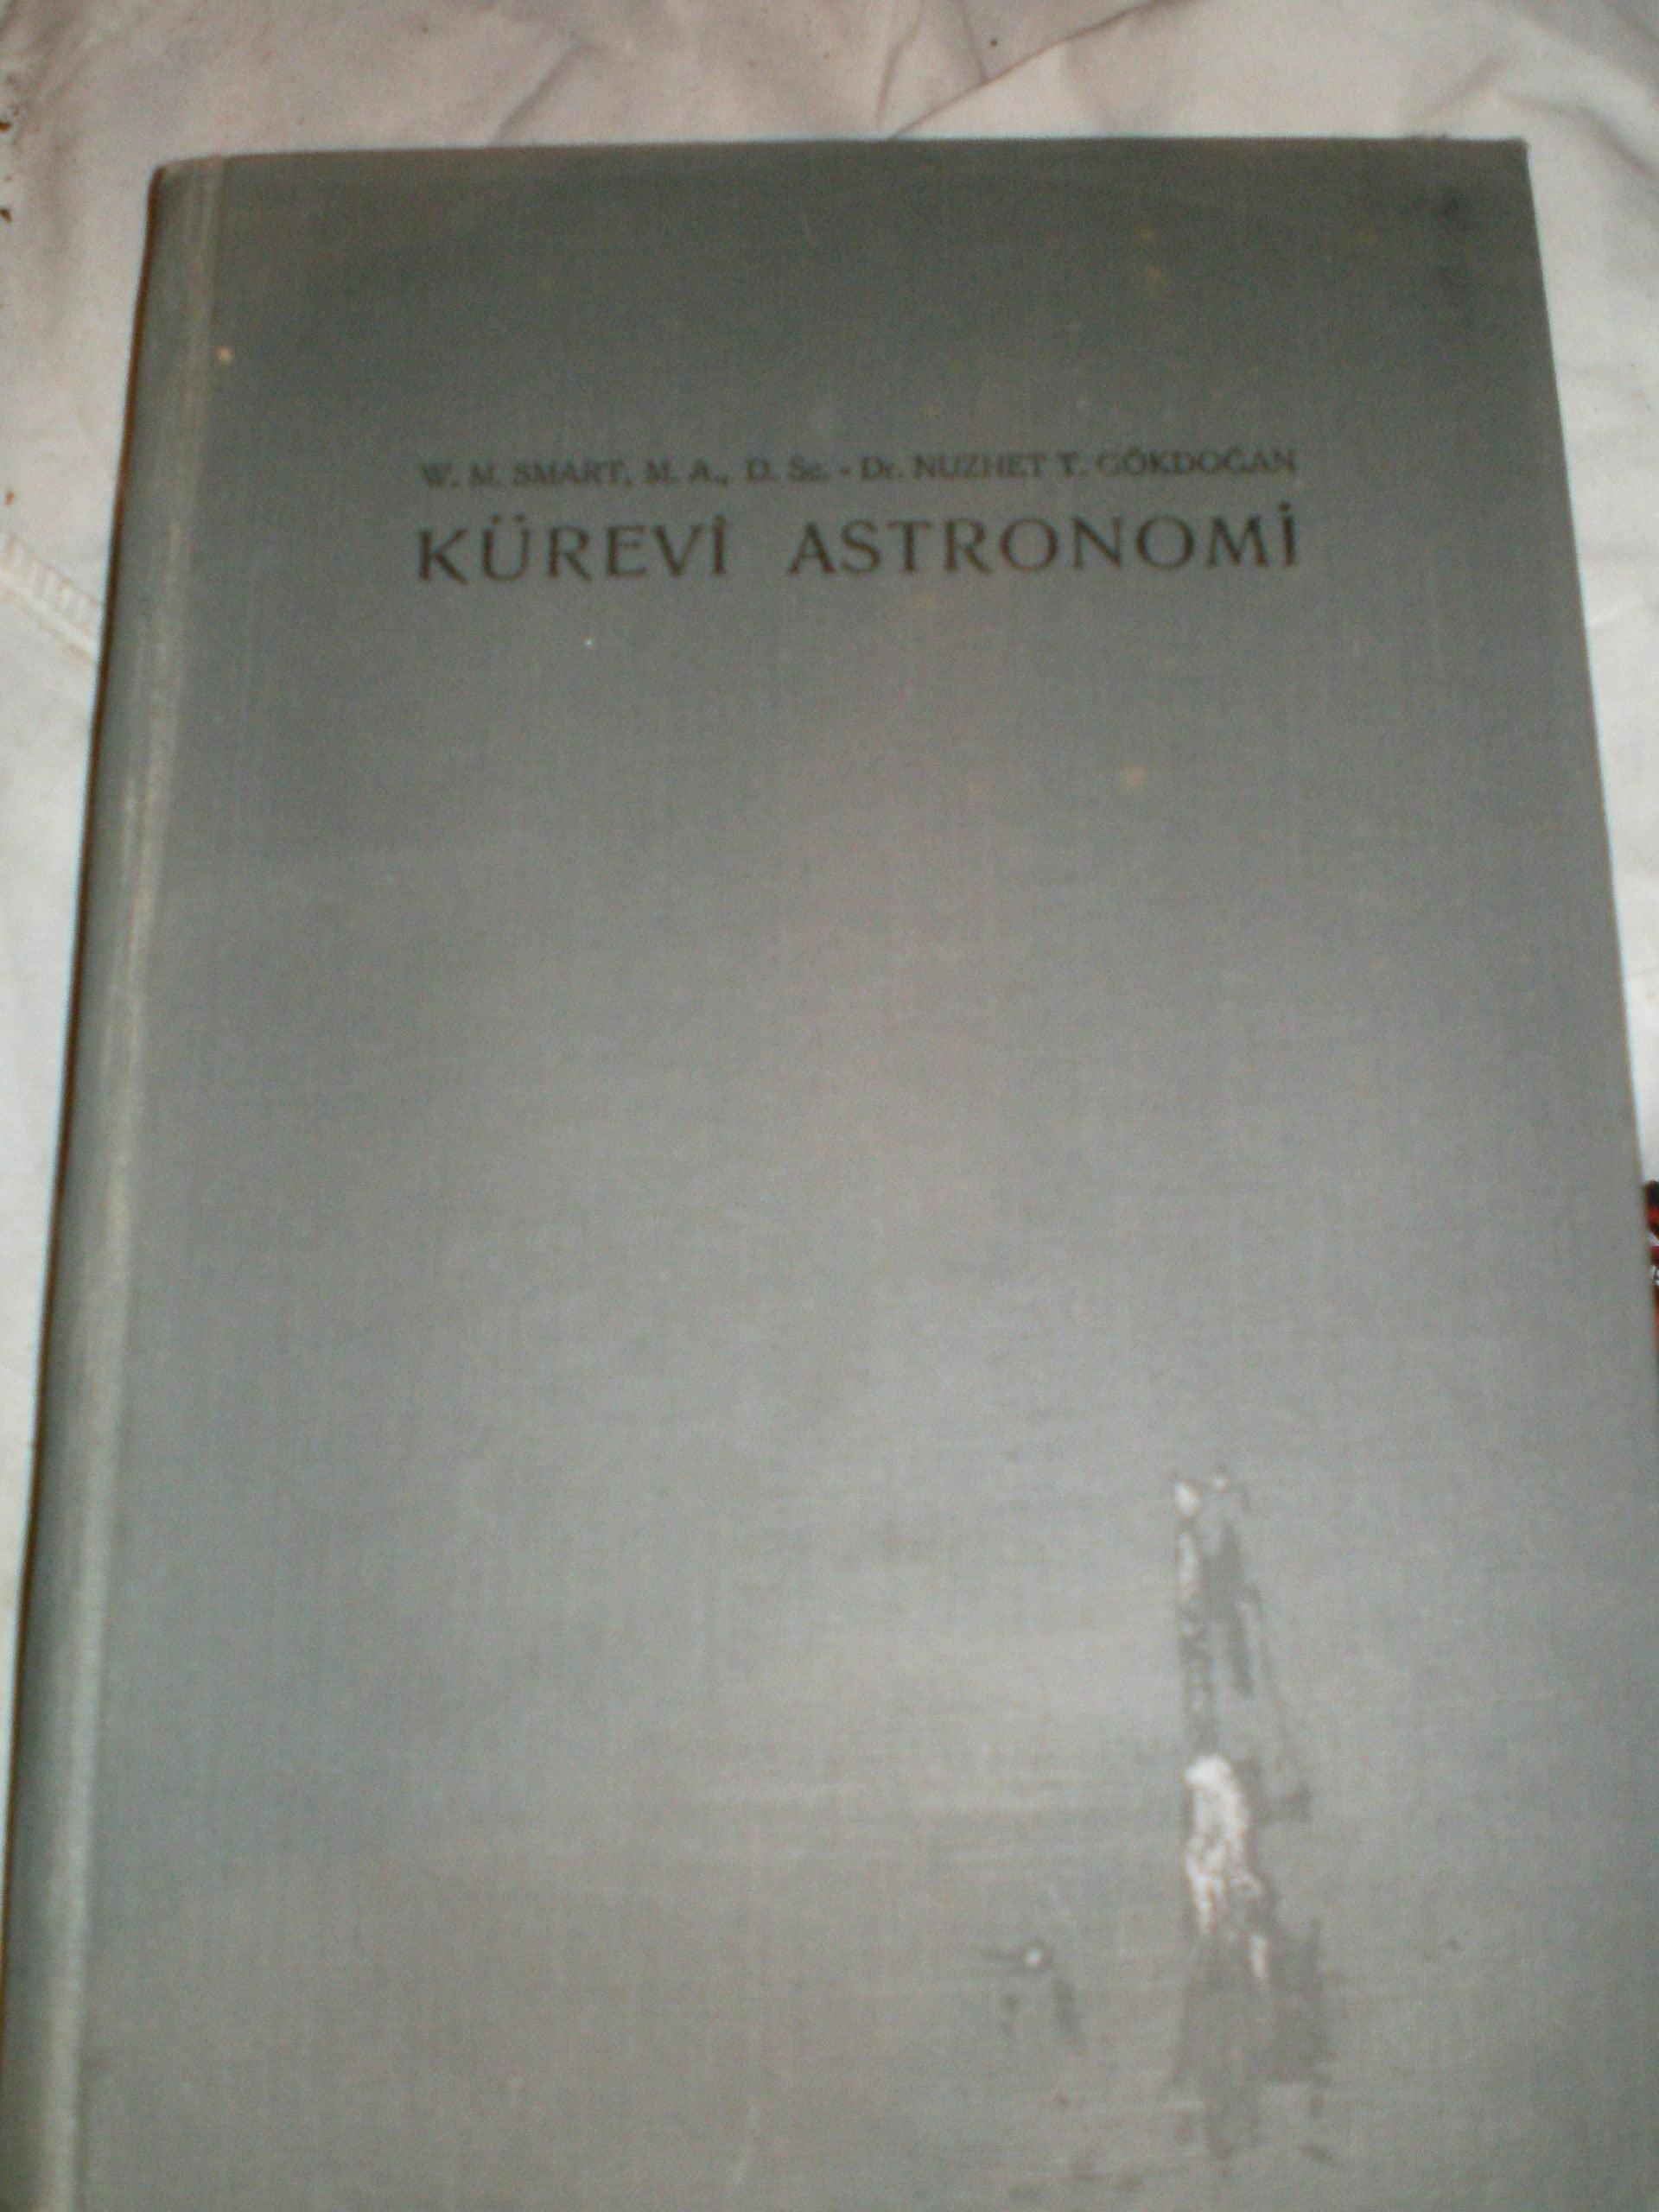 KÜREVİ ASTRONOMİ/W.M.SMART, M.A.,D. Sc.& Çev.DR.NUZHET T.GÖKDOĞAN/25 TL